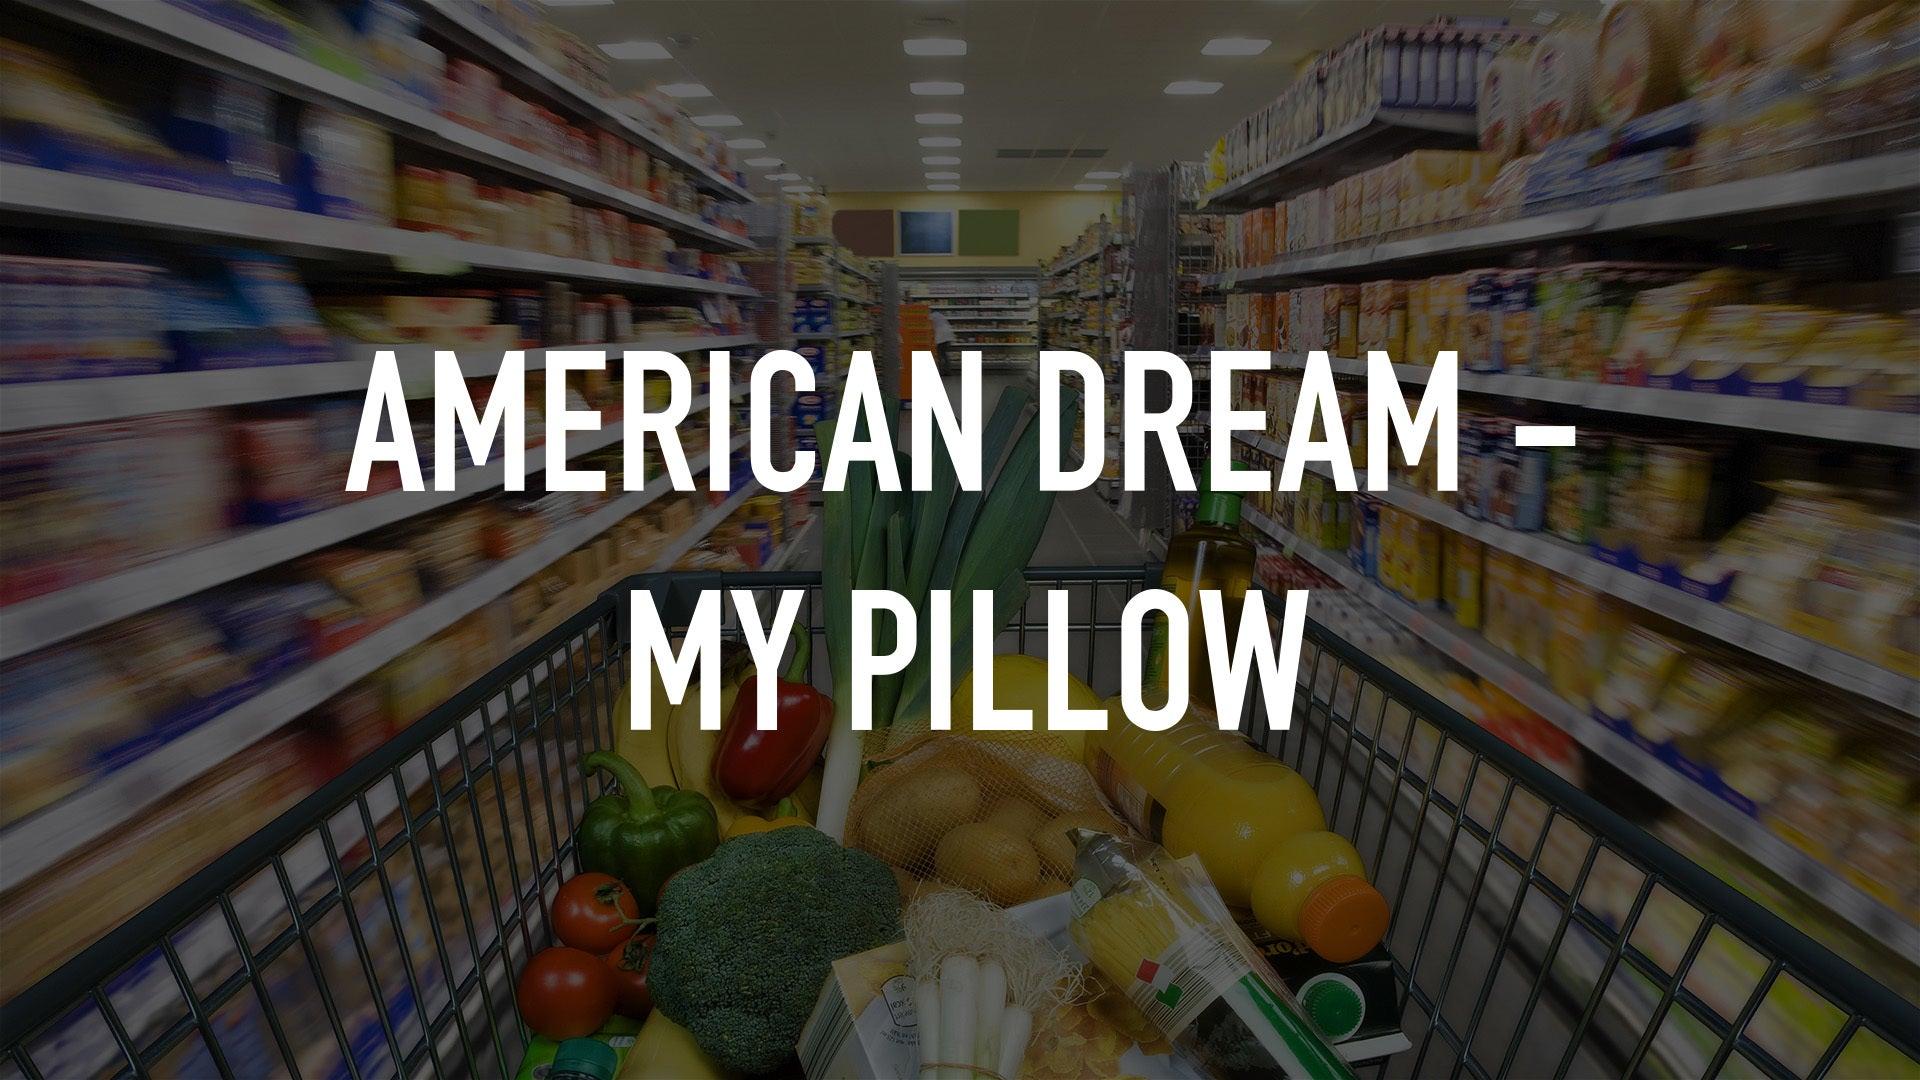 American Dream - My Pillow